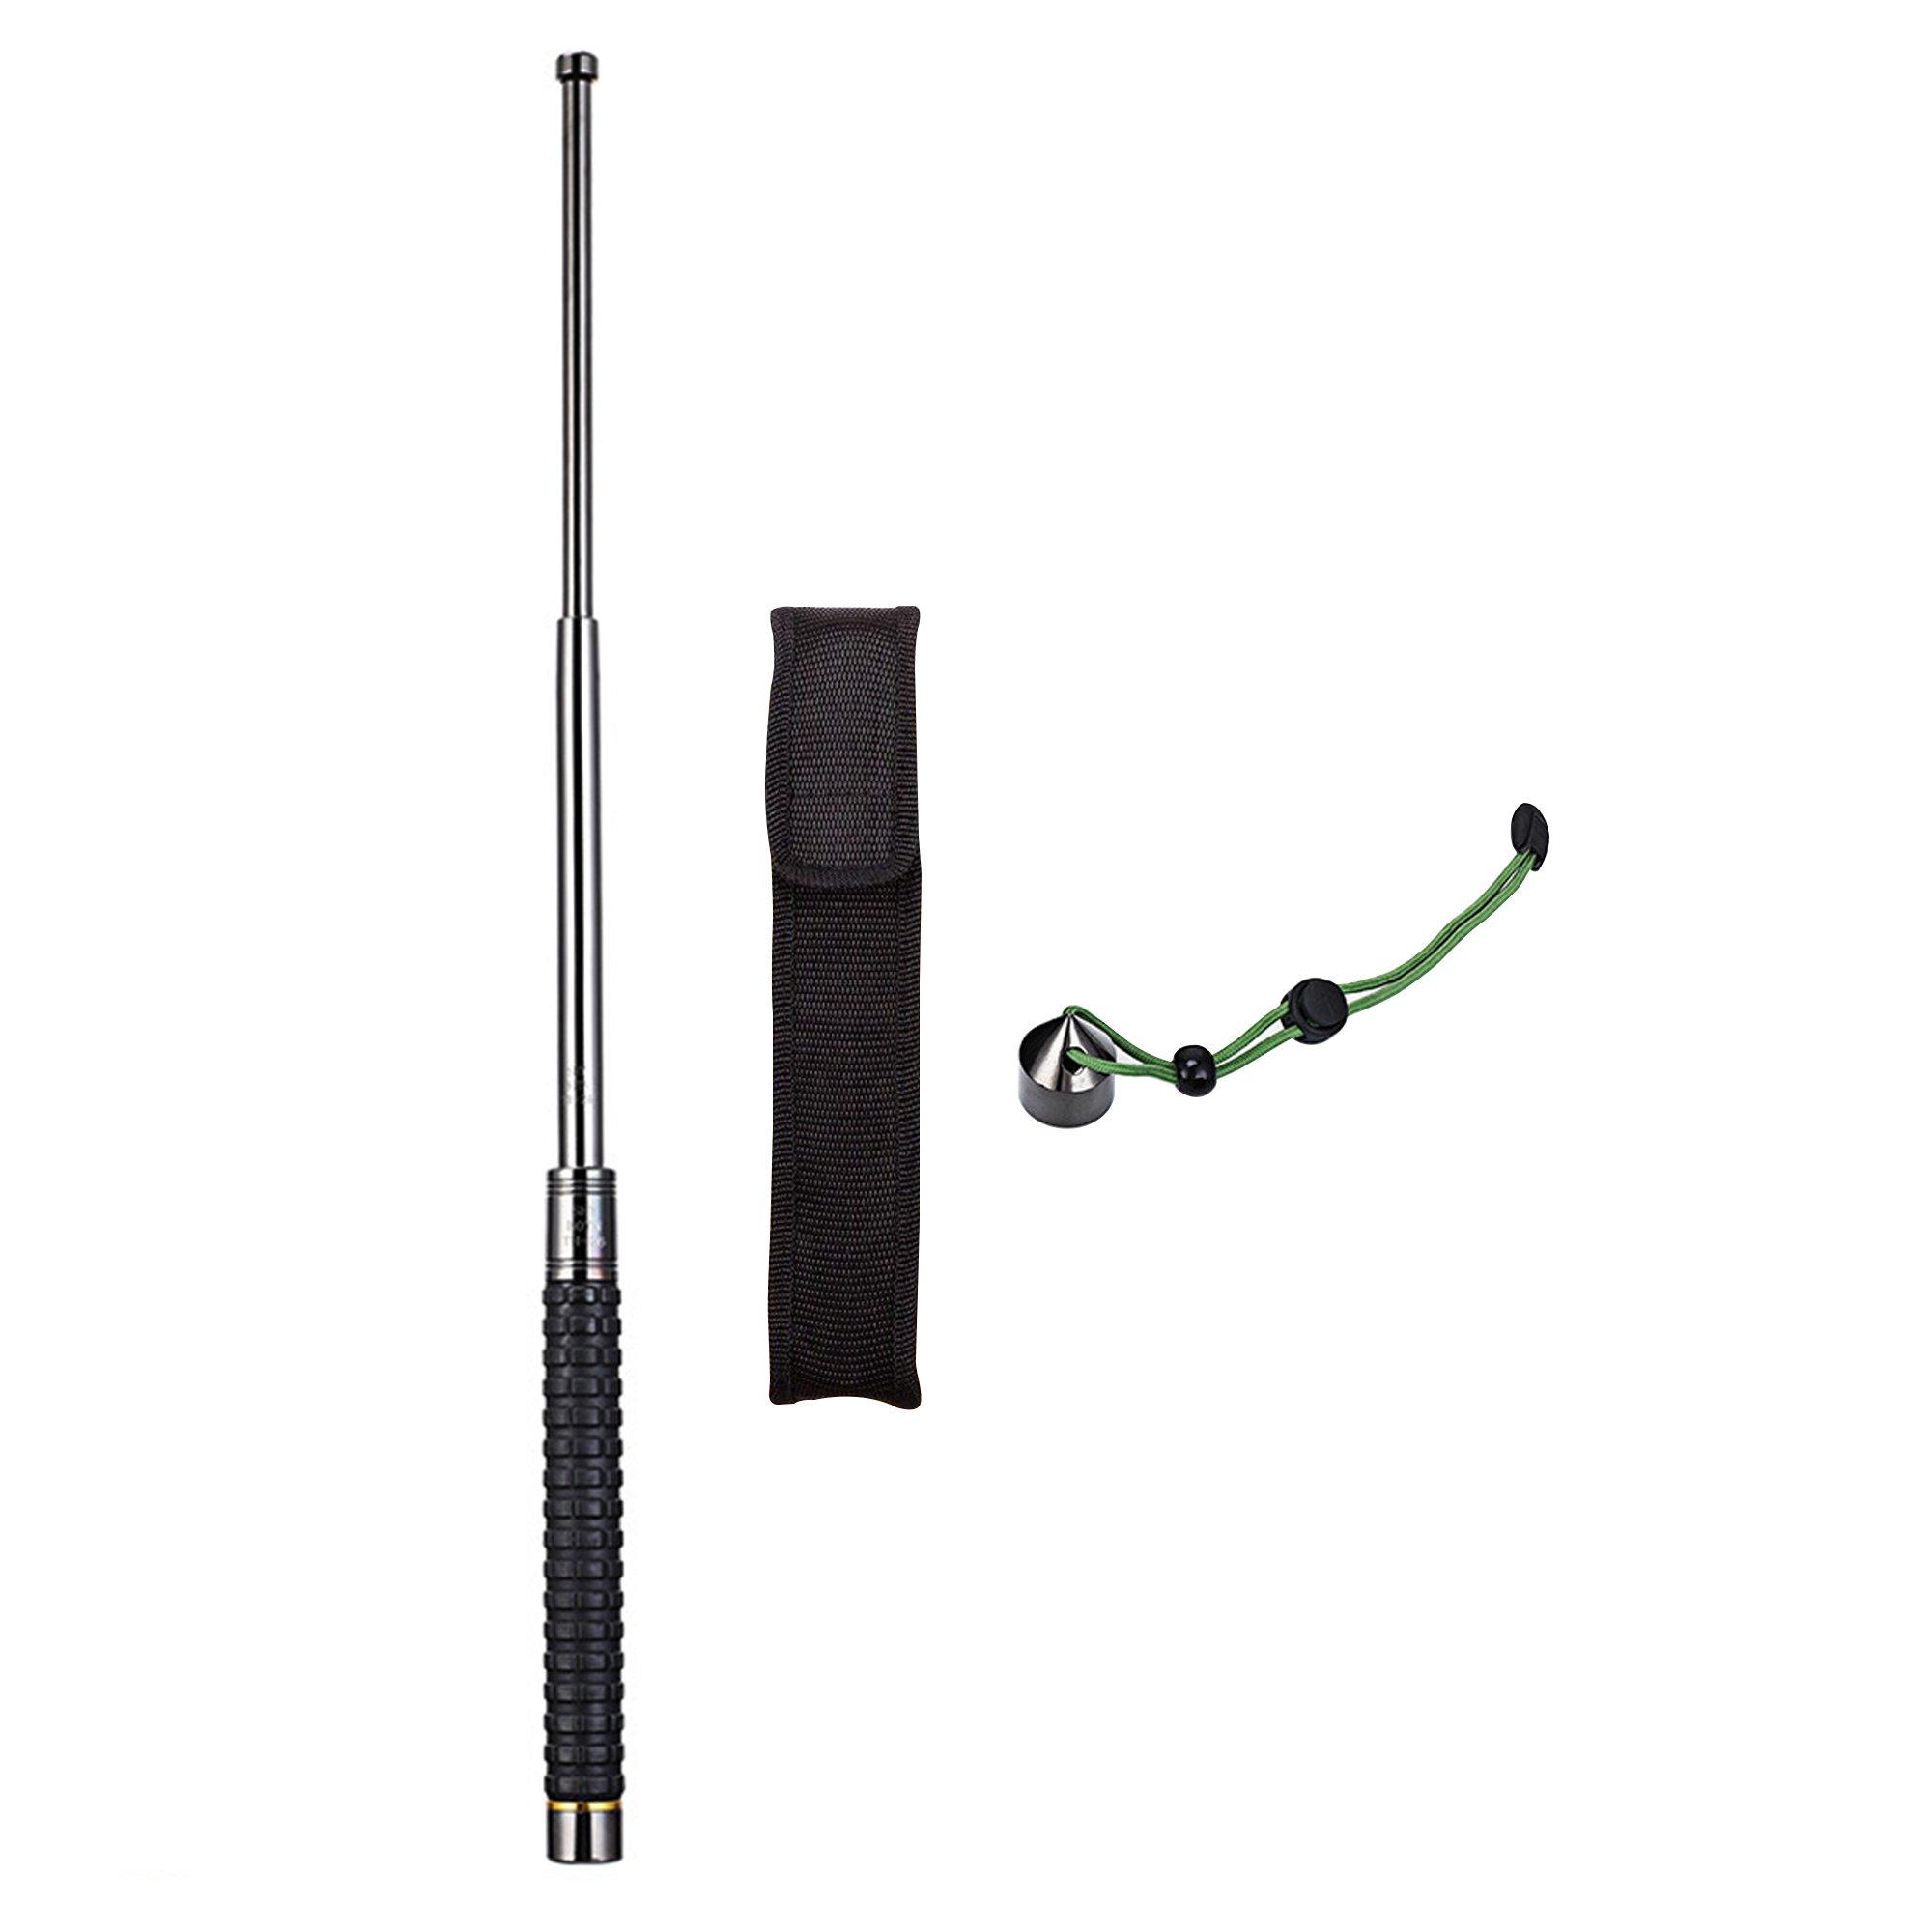 Telescopic Security Stick Baton